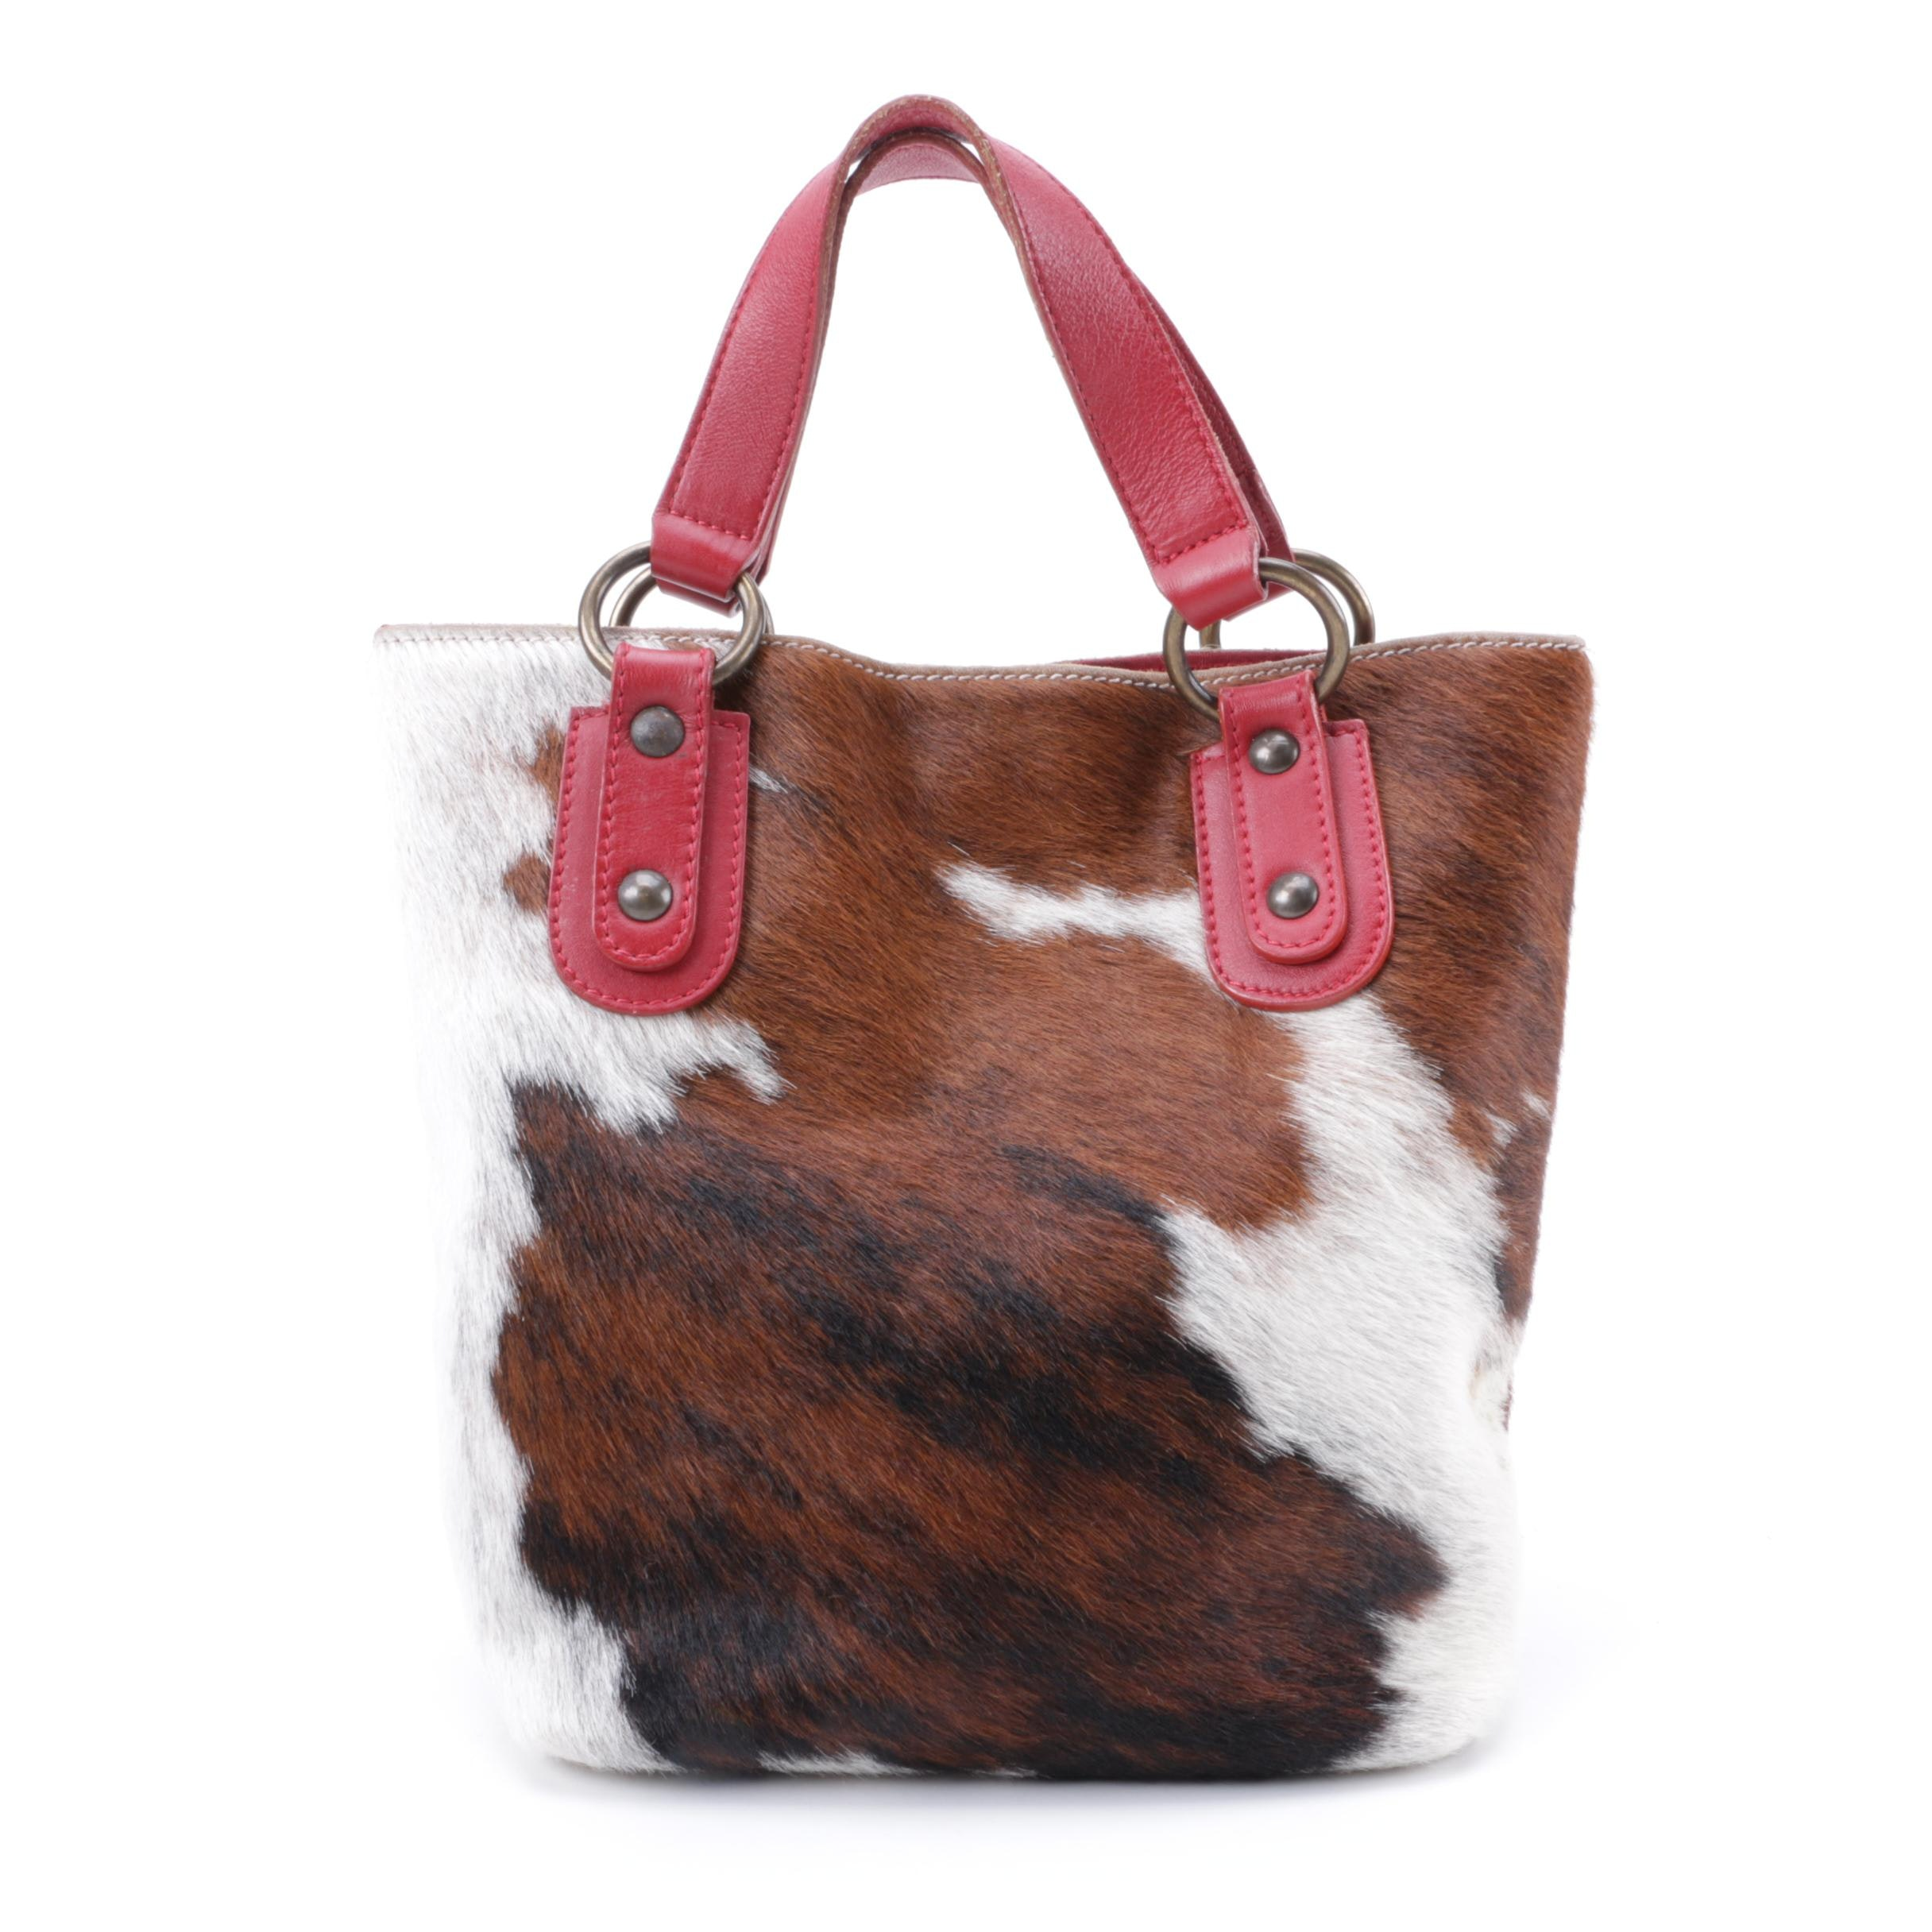 Maurizio Taiuti Calfskin and Leather handbag